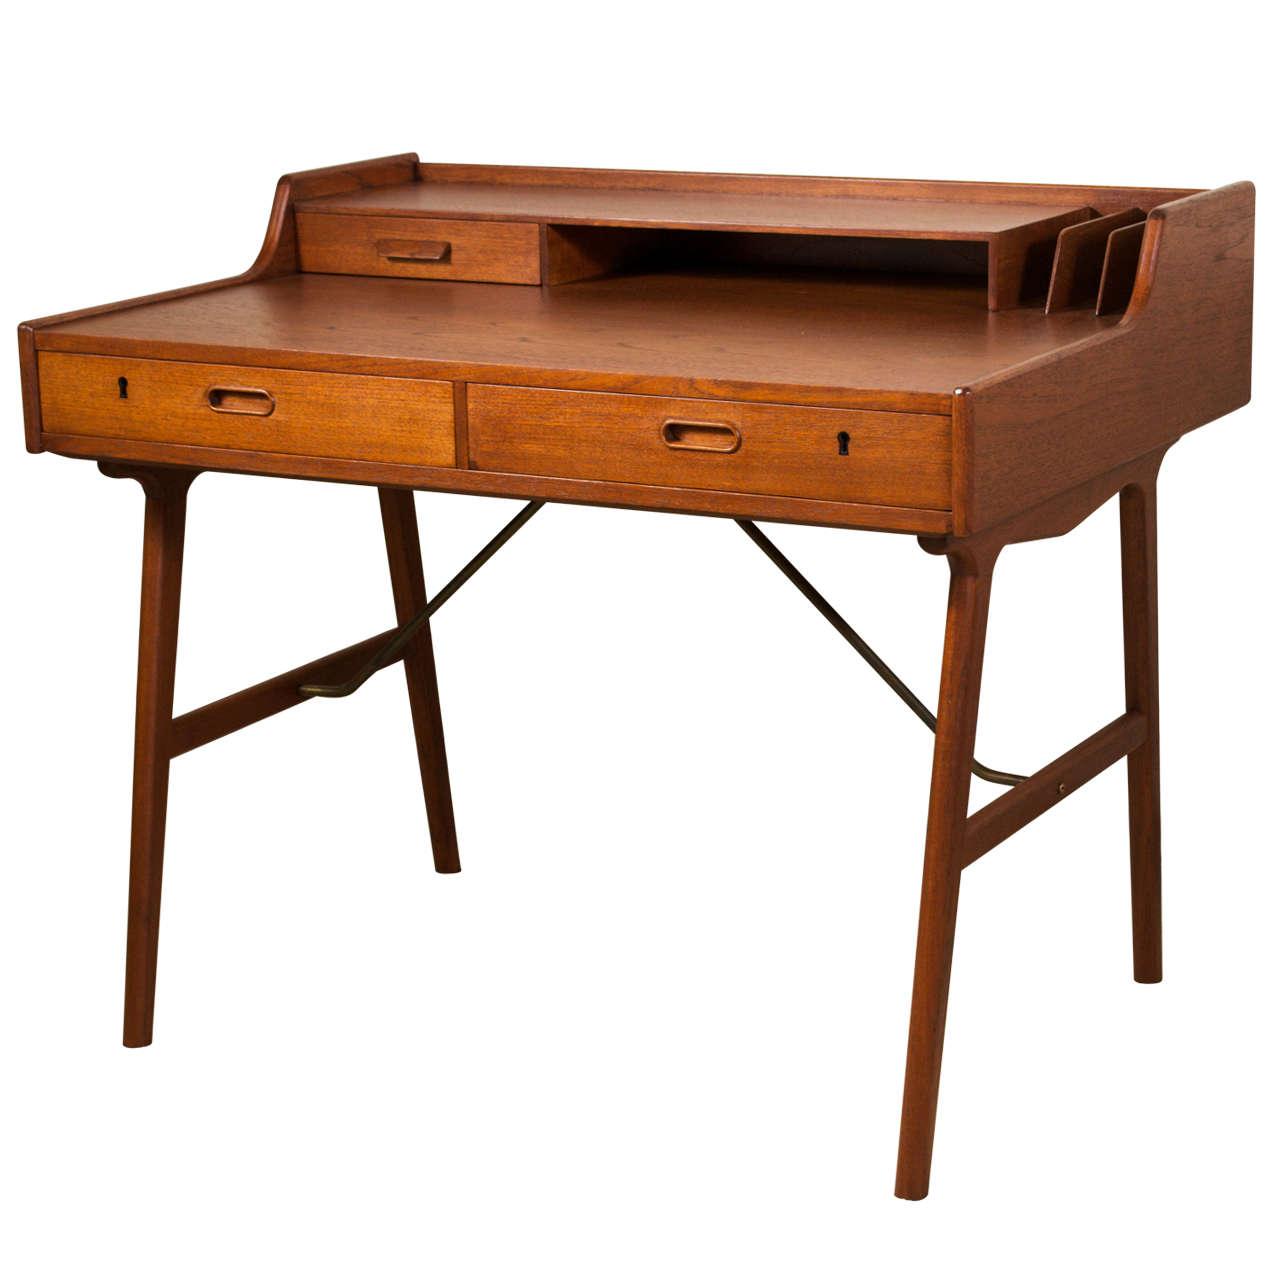 Danish Modern Desk In Teak By Arne Iversen Wahl At 1stdibs